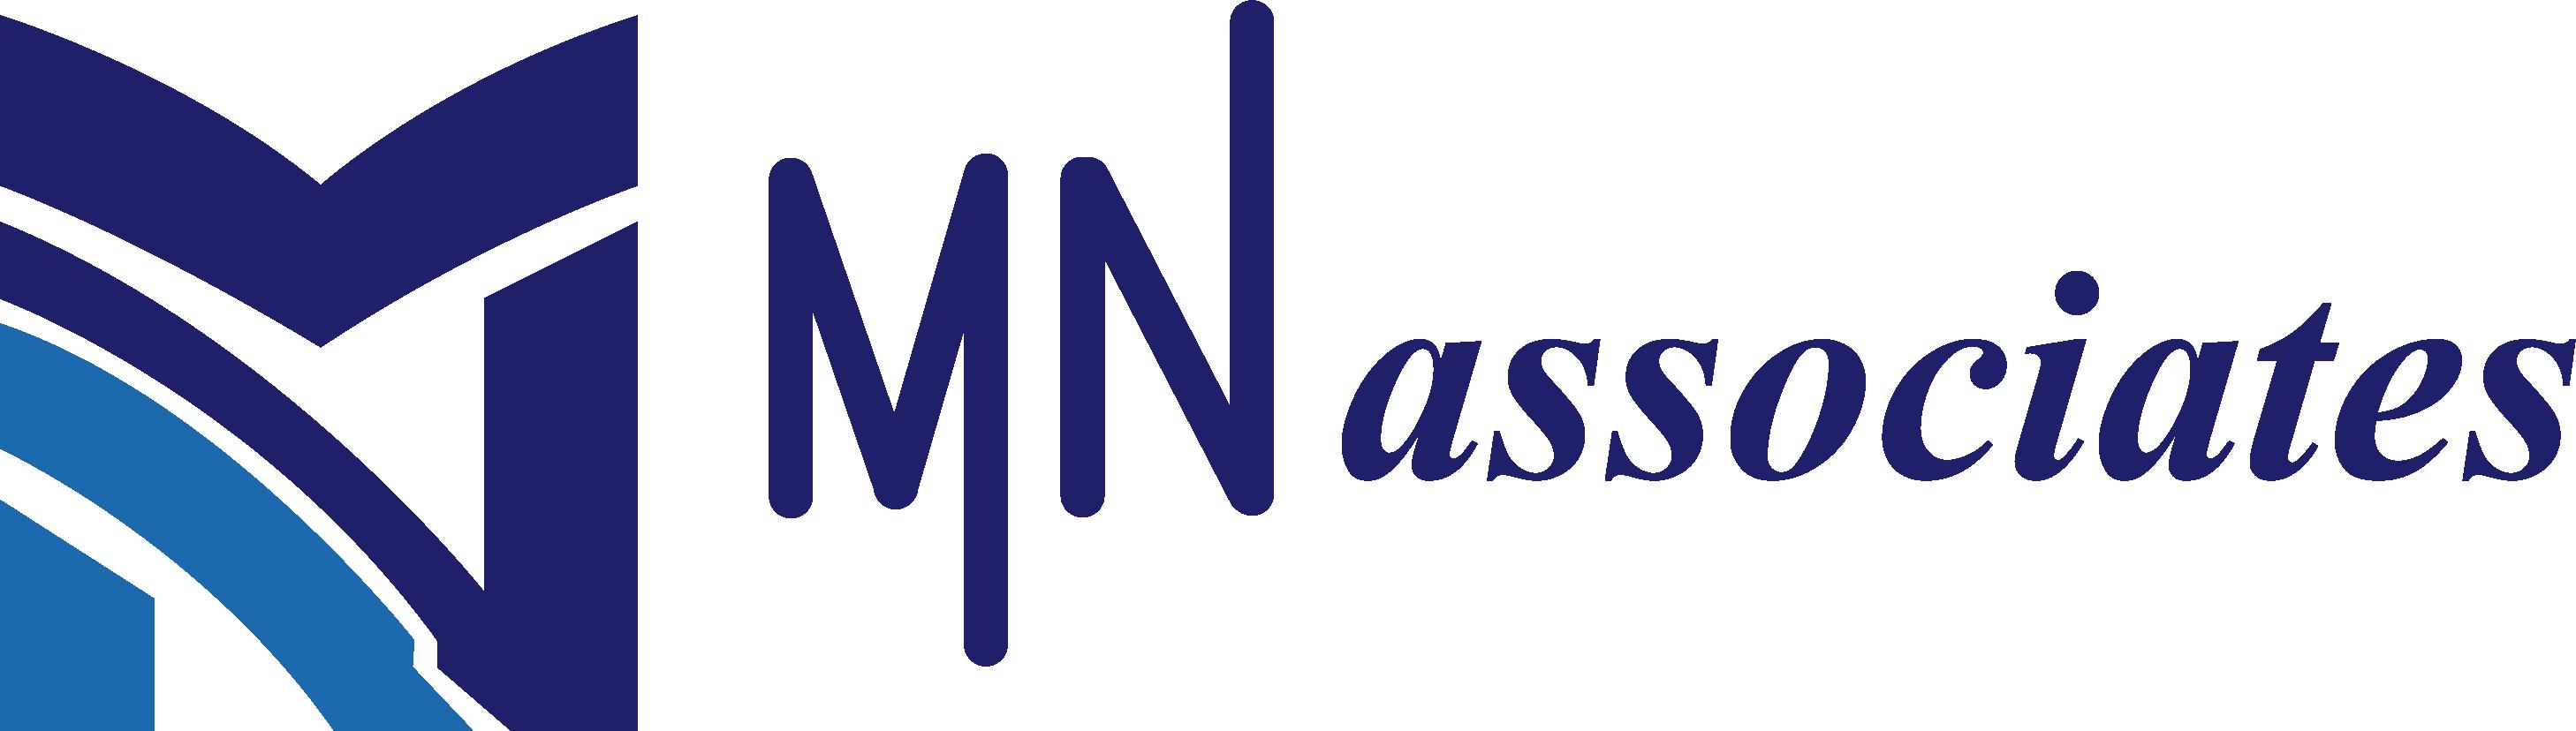 MN Associates (KL) Sdn Bhd